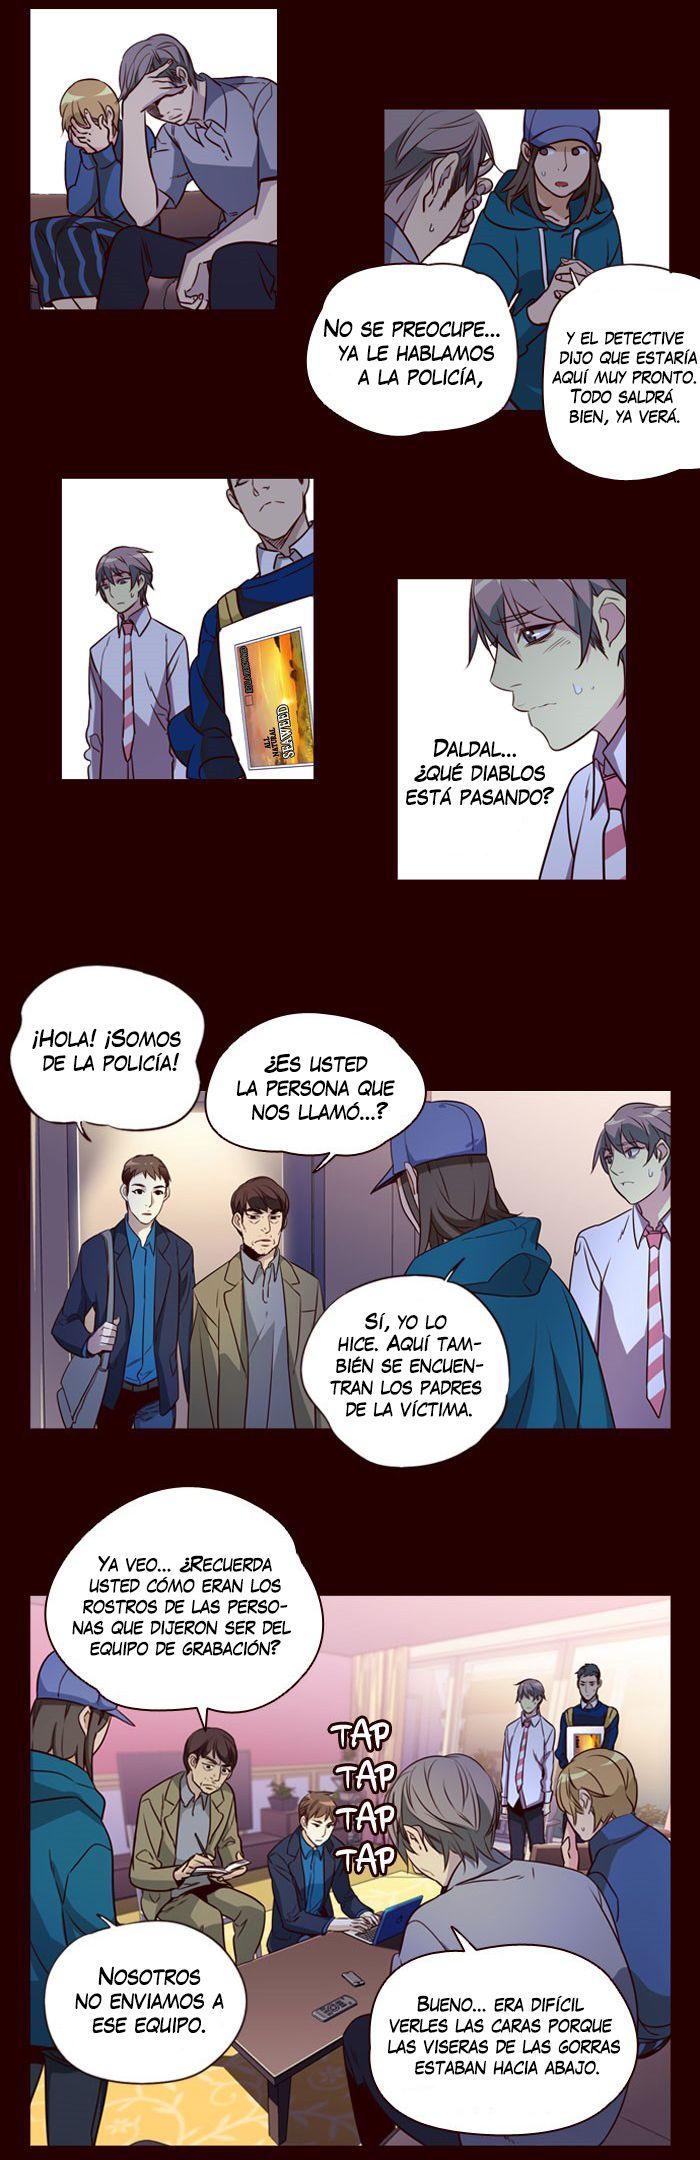 http://c5.ninemanga.com/es_manga/32/416/458197/9adbaadf095c8de0d2d0b53fe92a5dbb.jpg Page 6